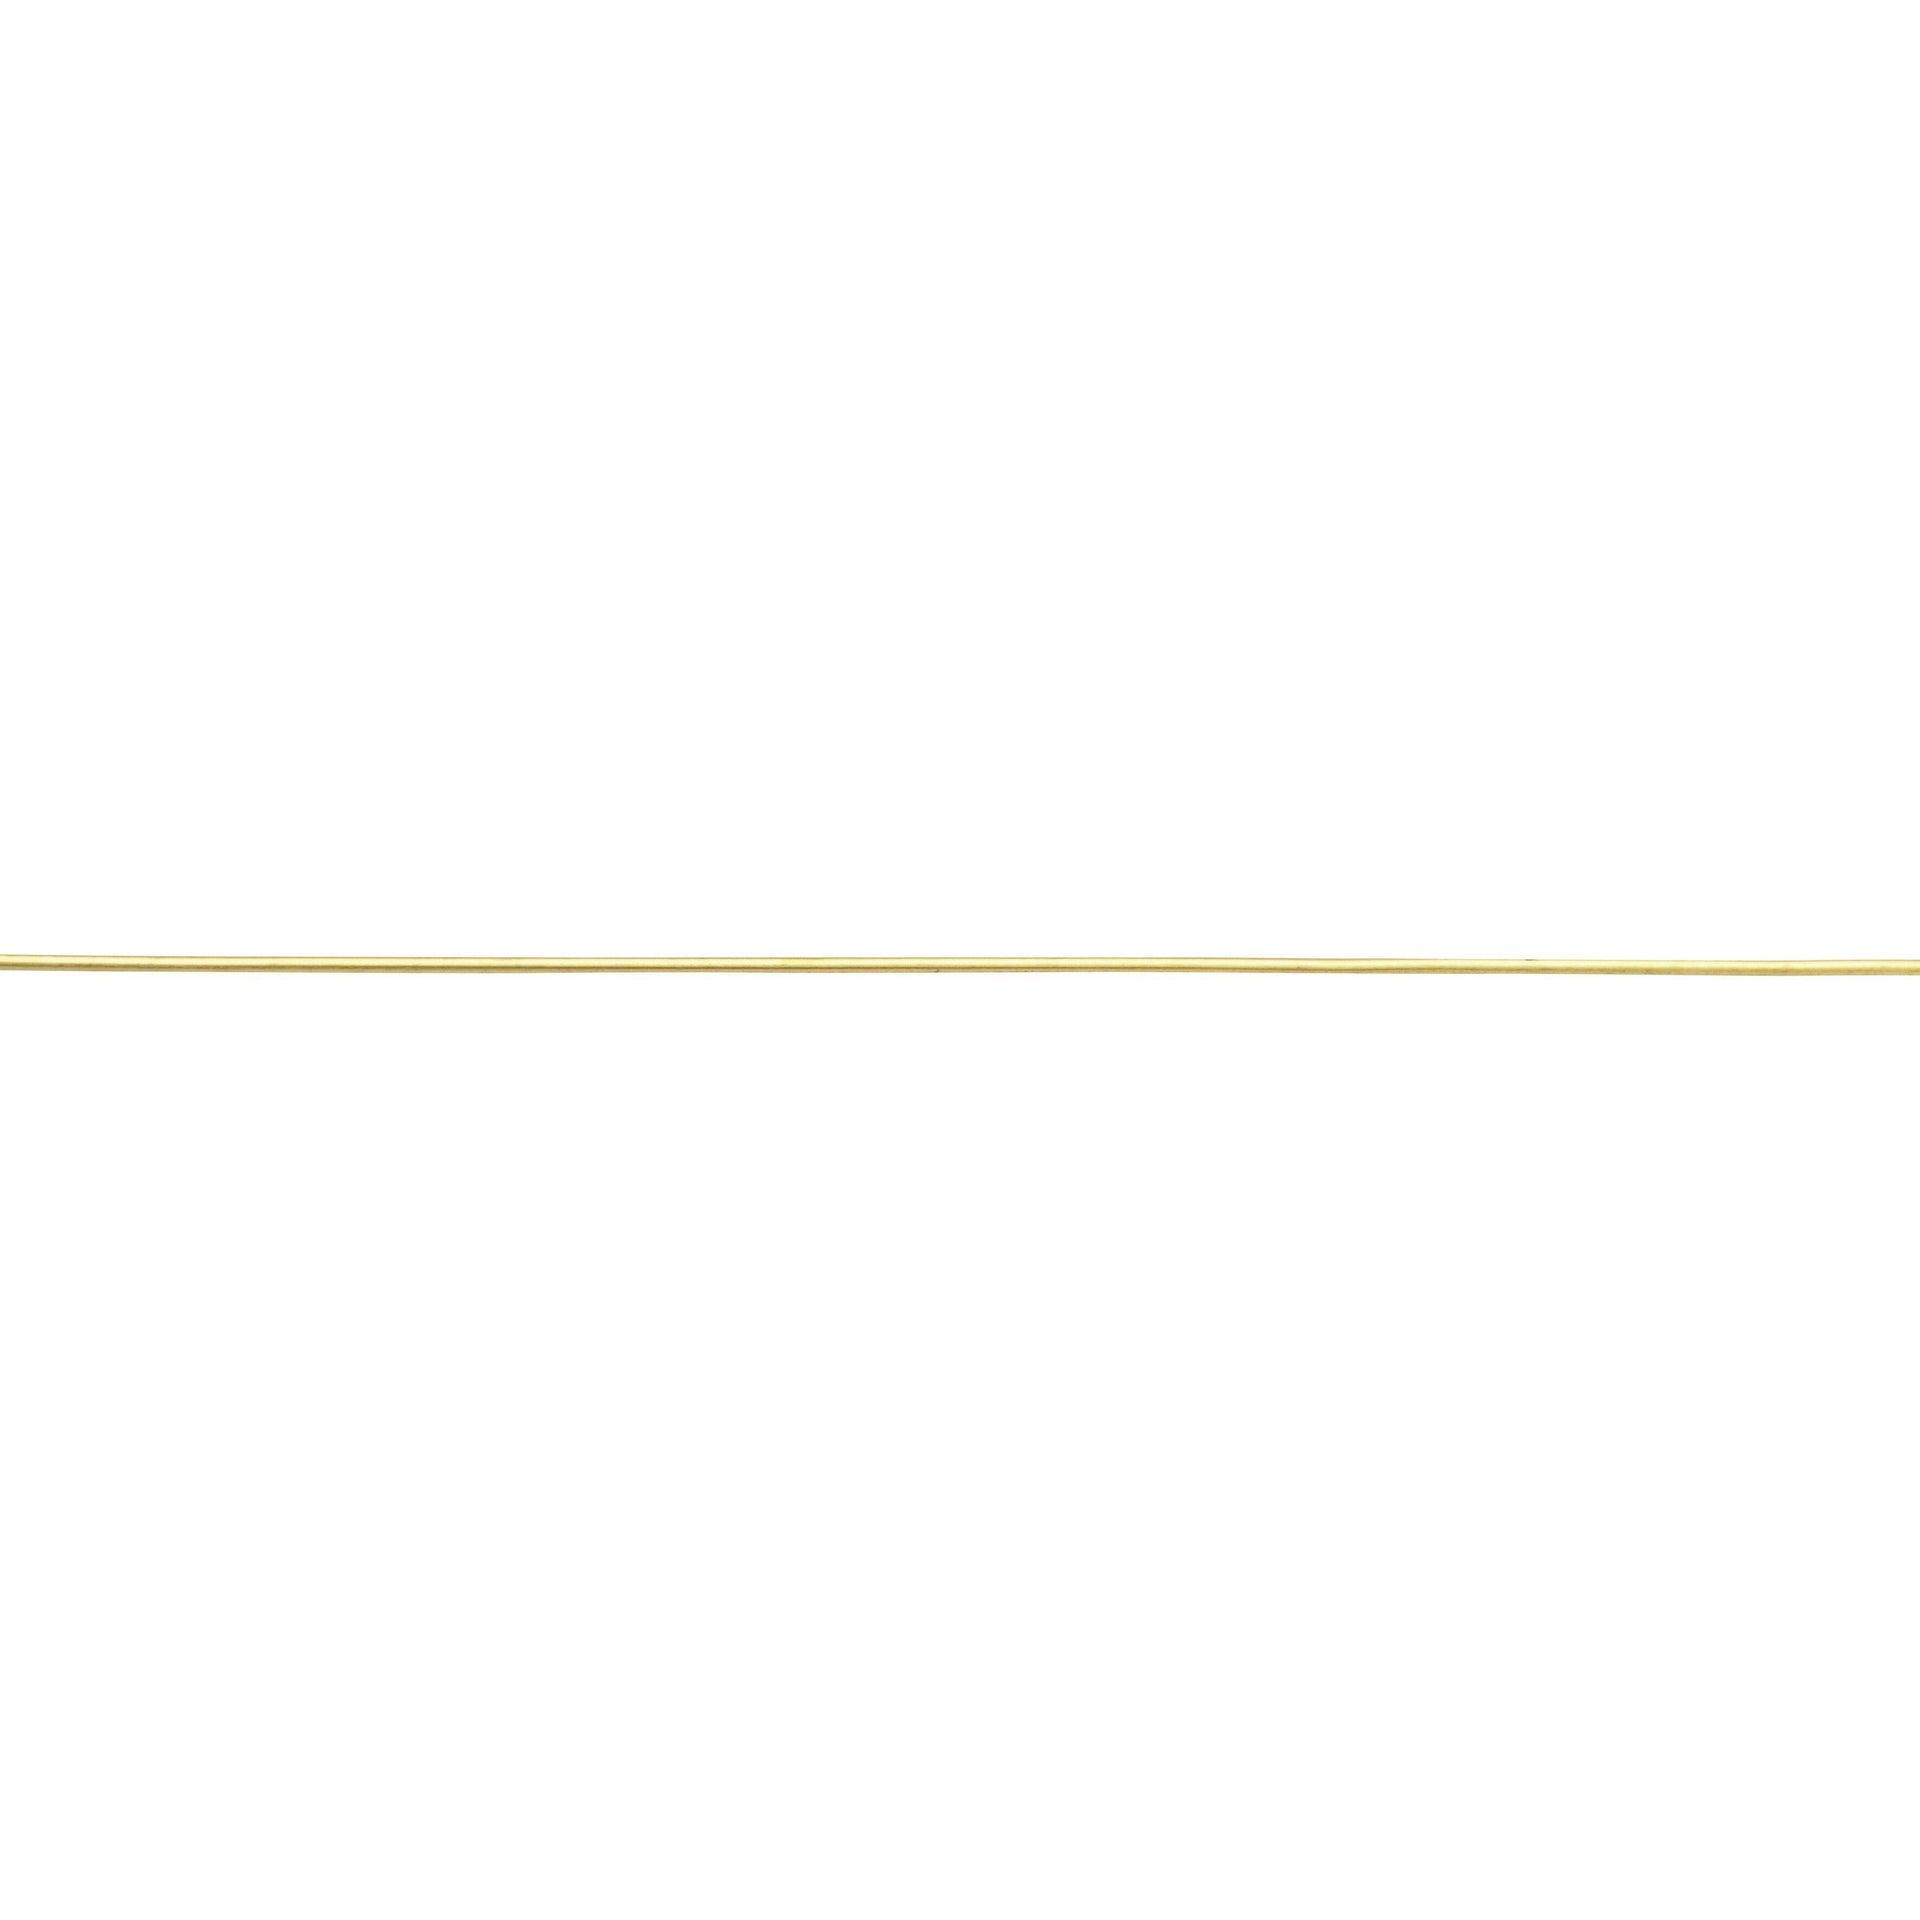 Filo in ottone STANDERS Ø 0.8 mm x L 25 m - 3